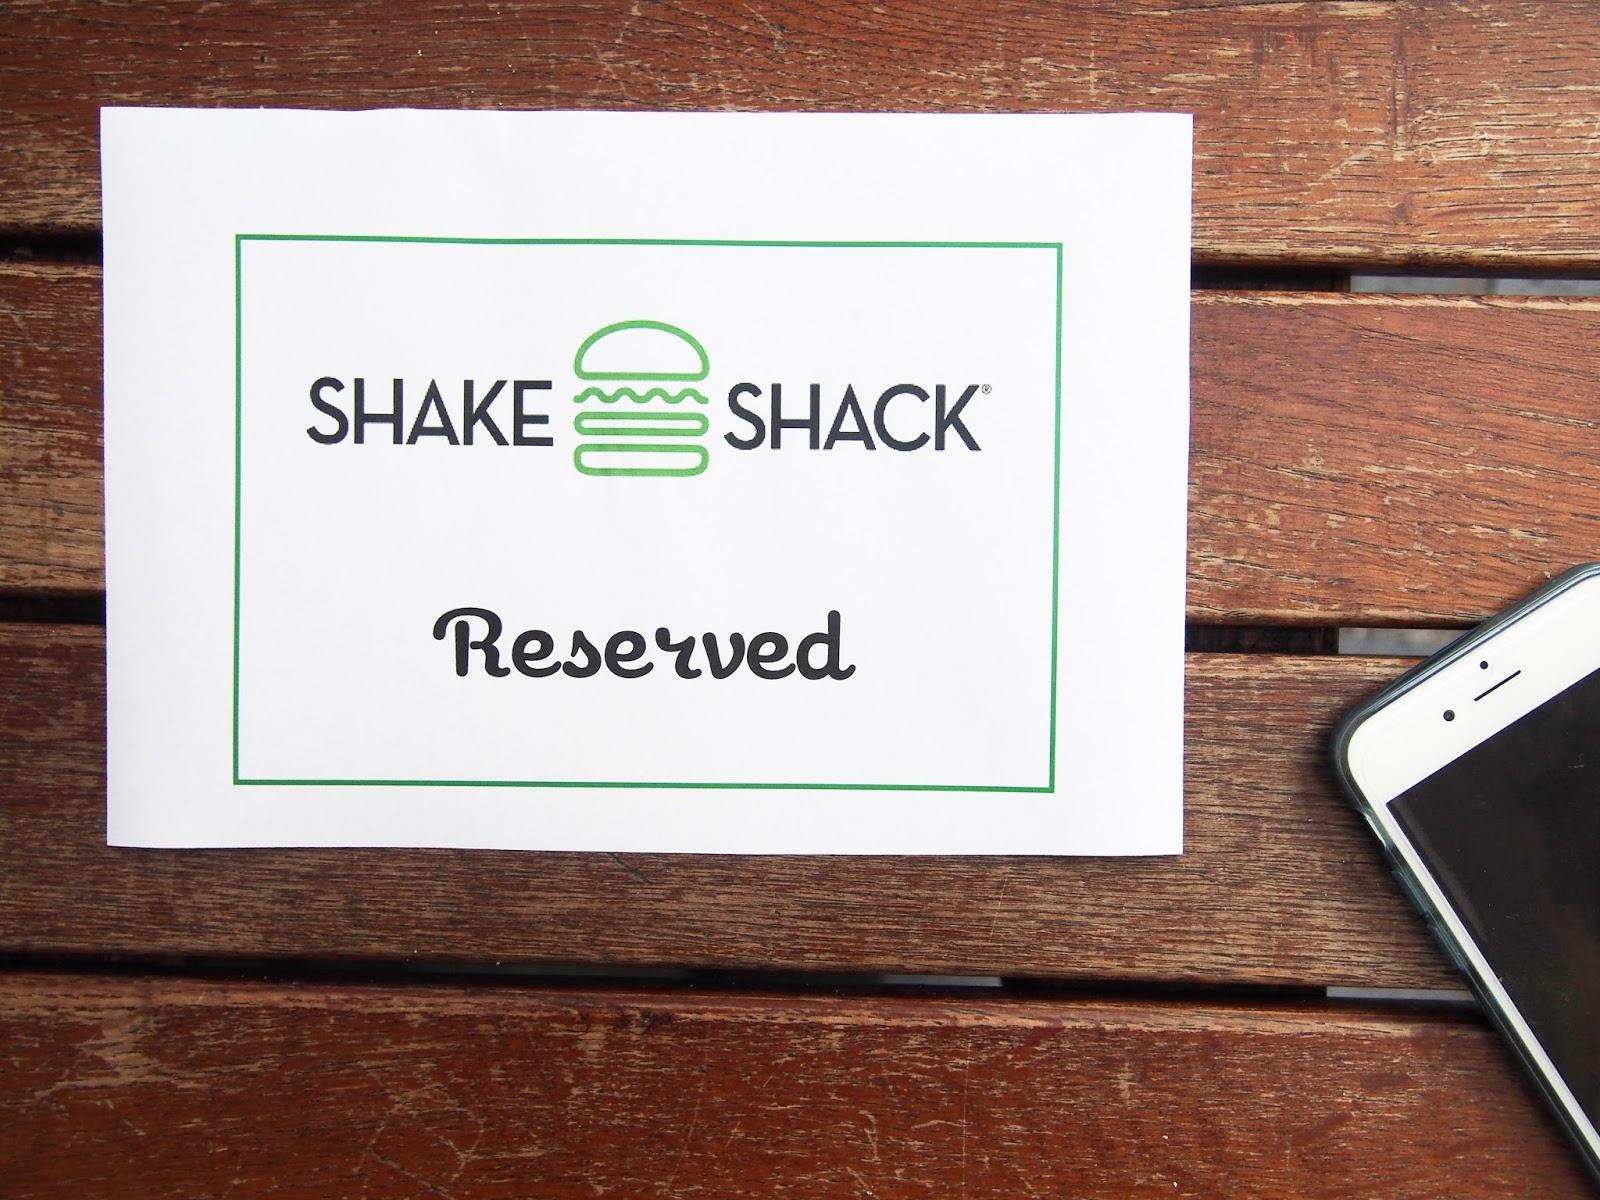 Major Oak Burger - Shake Shack